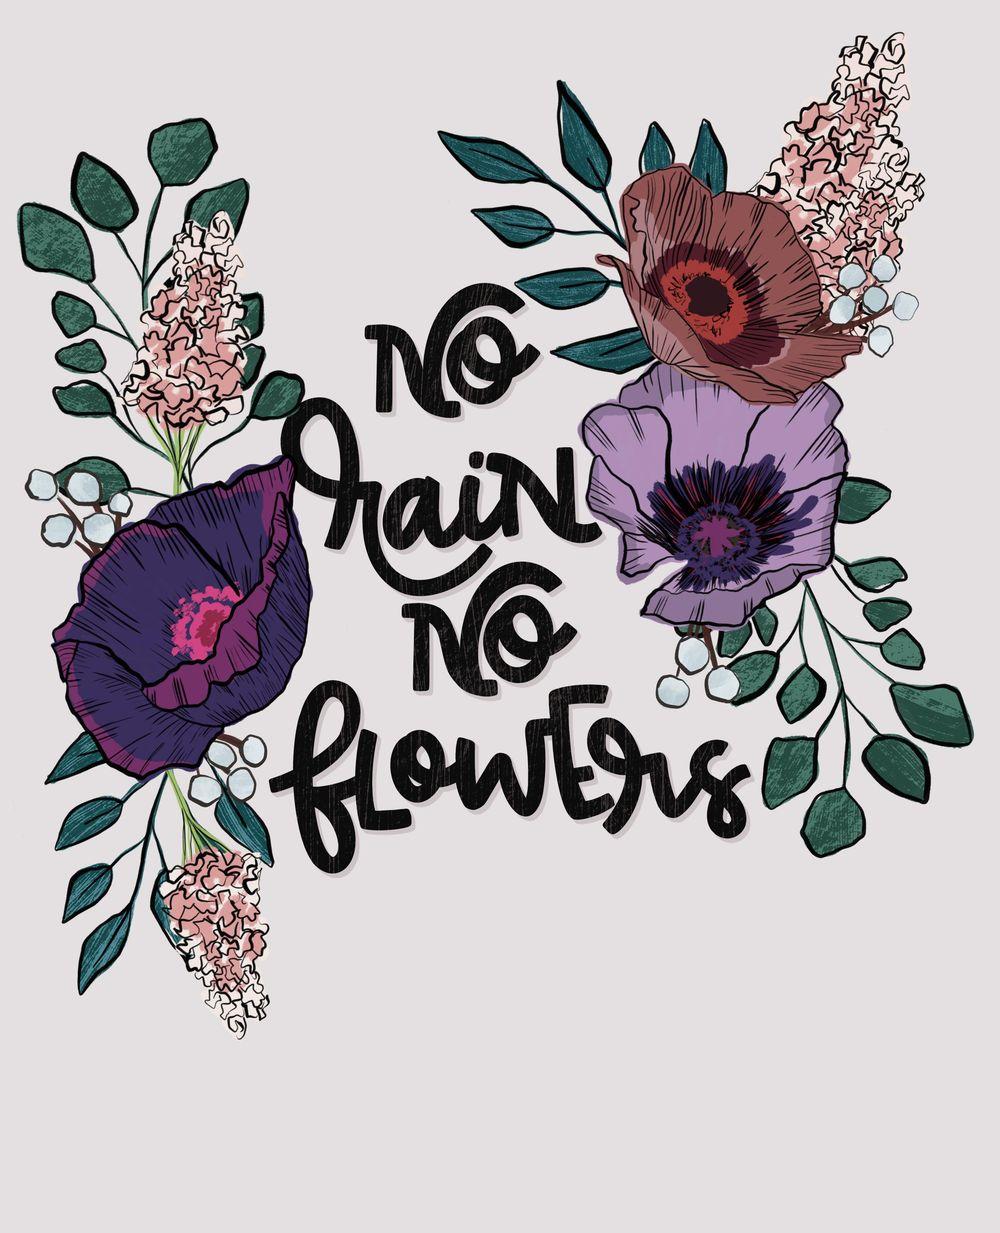 No Rain No Flower - image 1 - student project